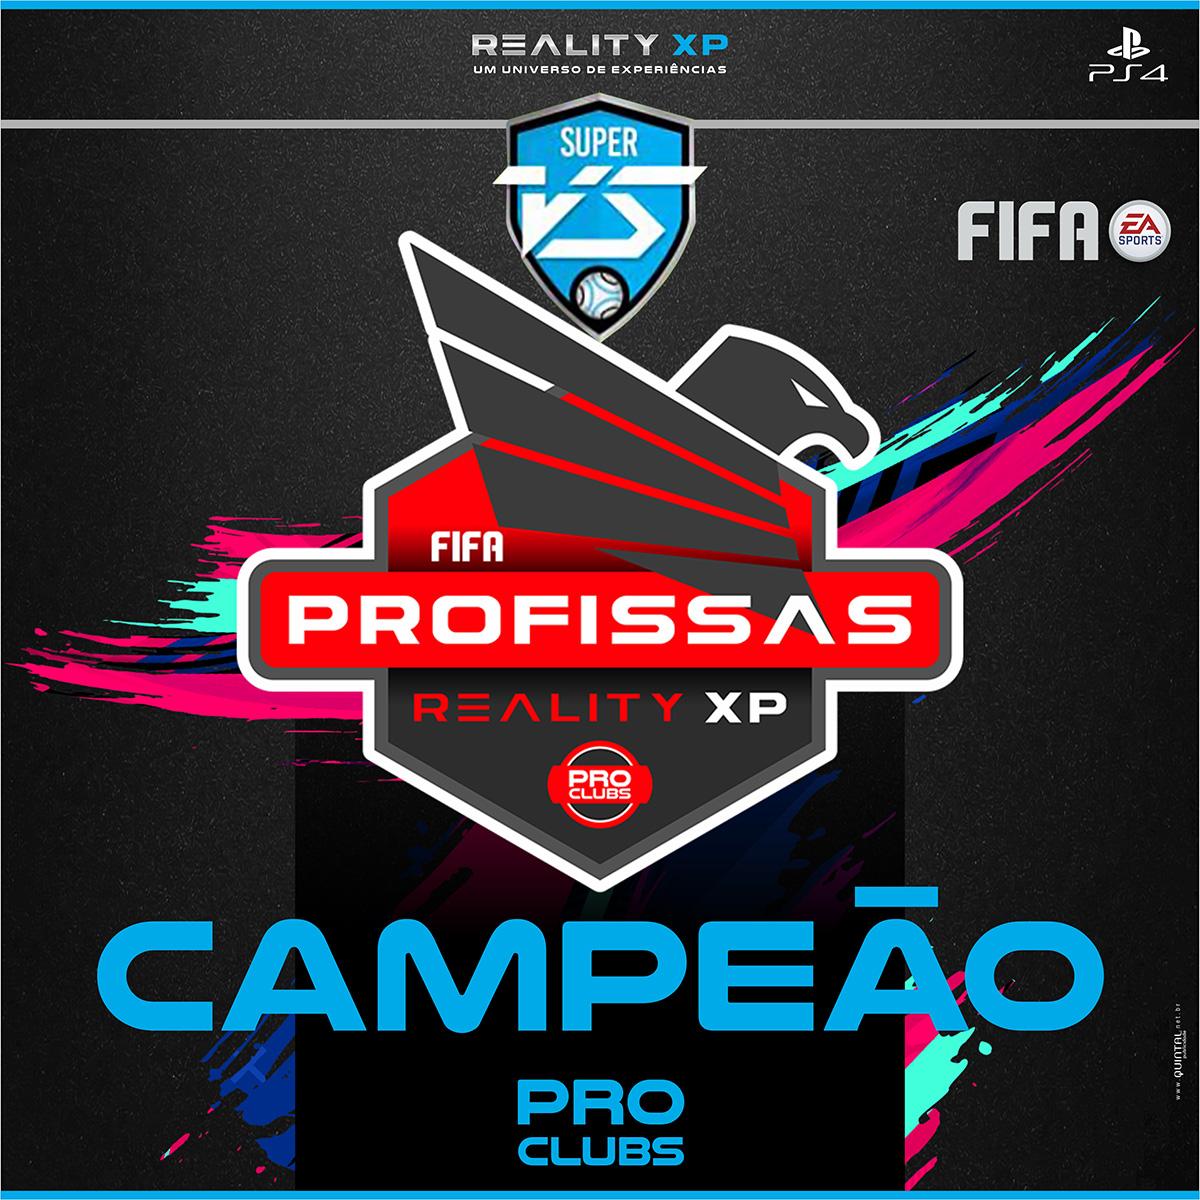 RS_ProCLUBS__FIFA_03